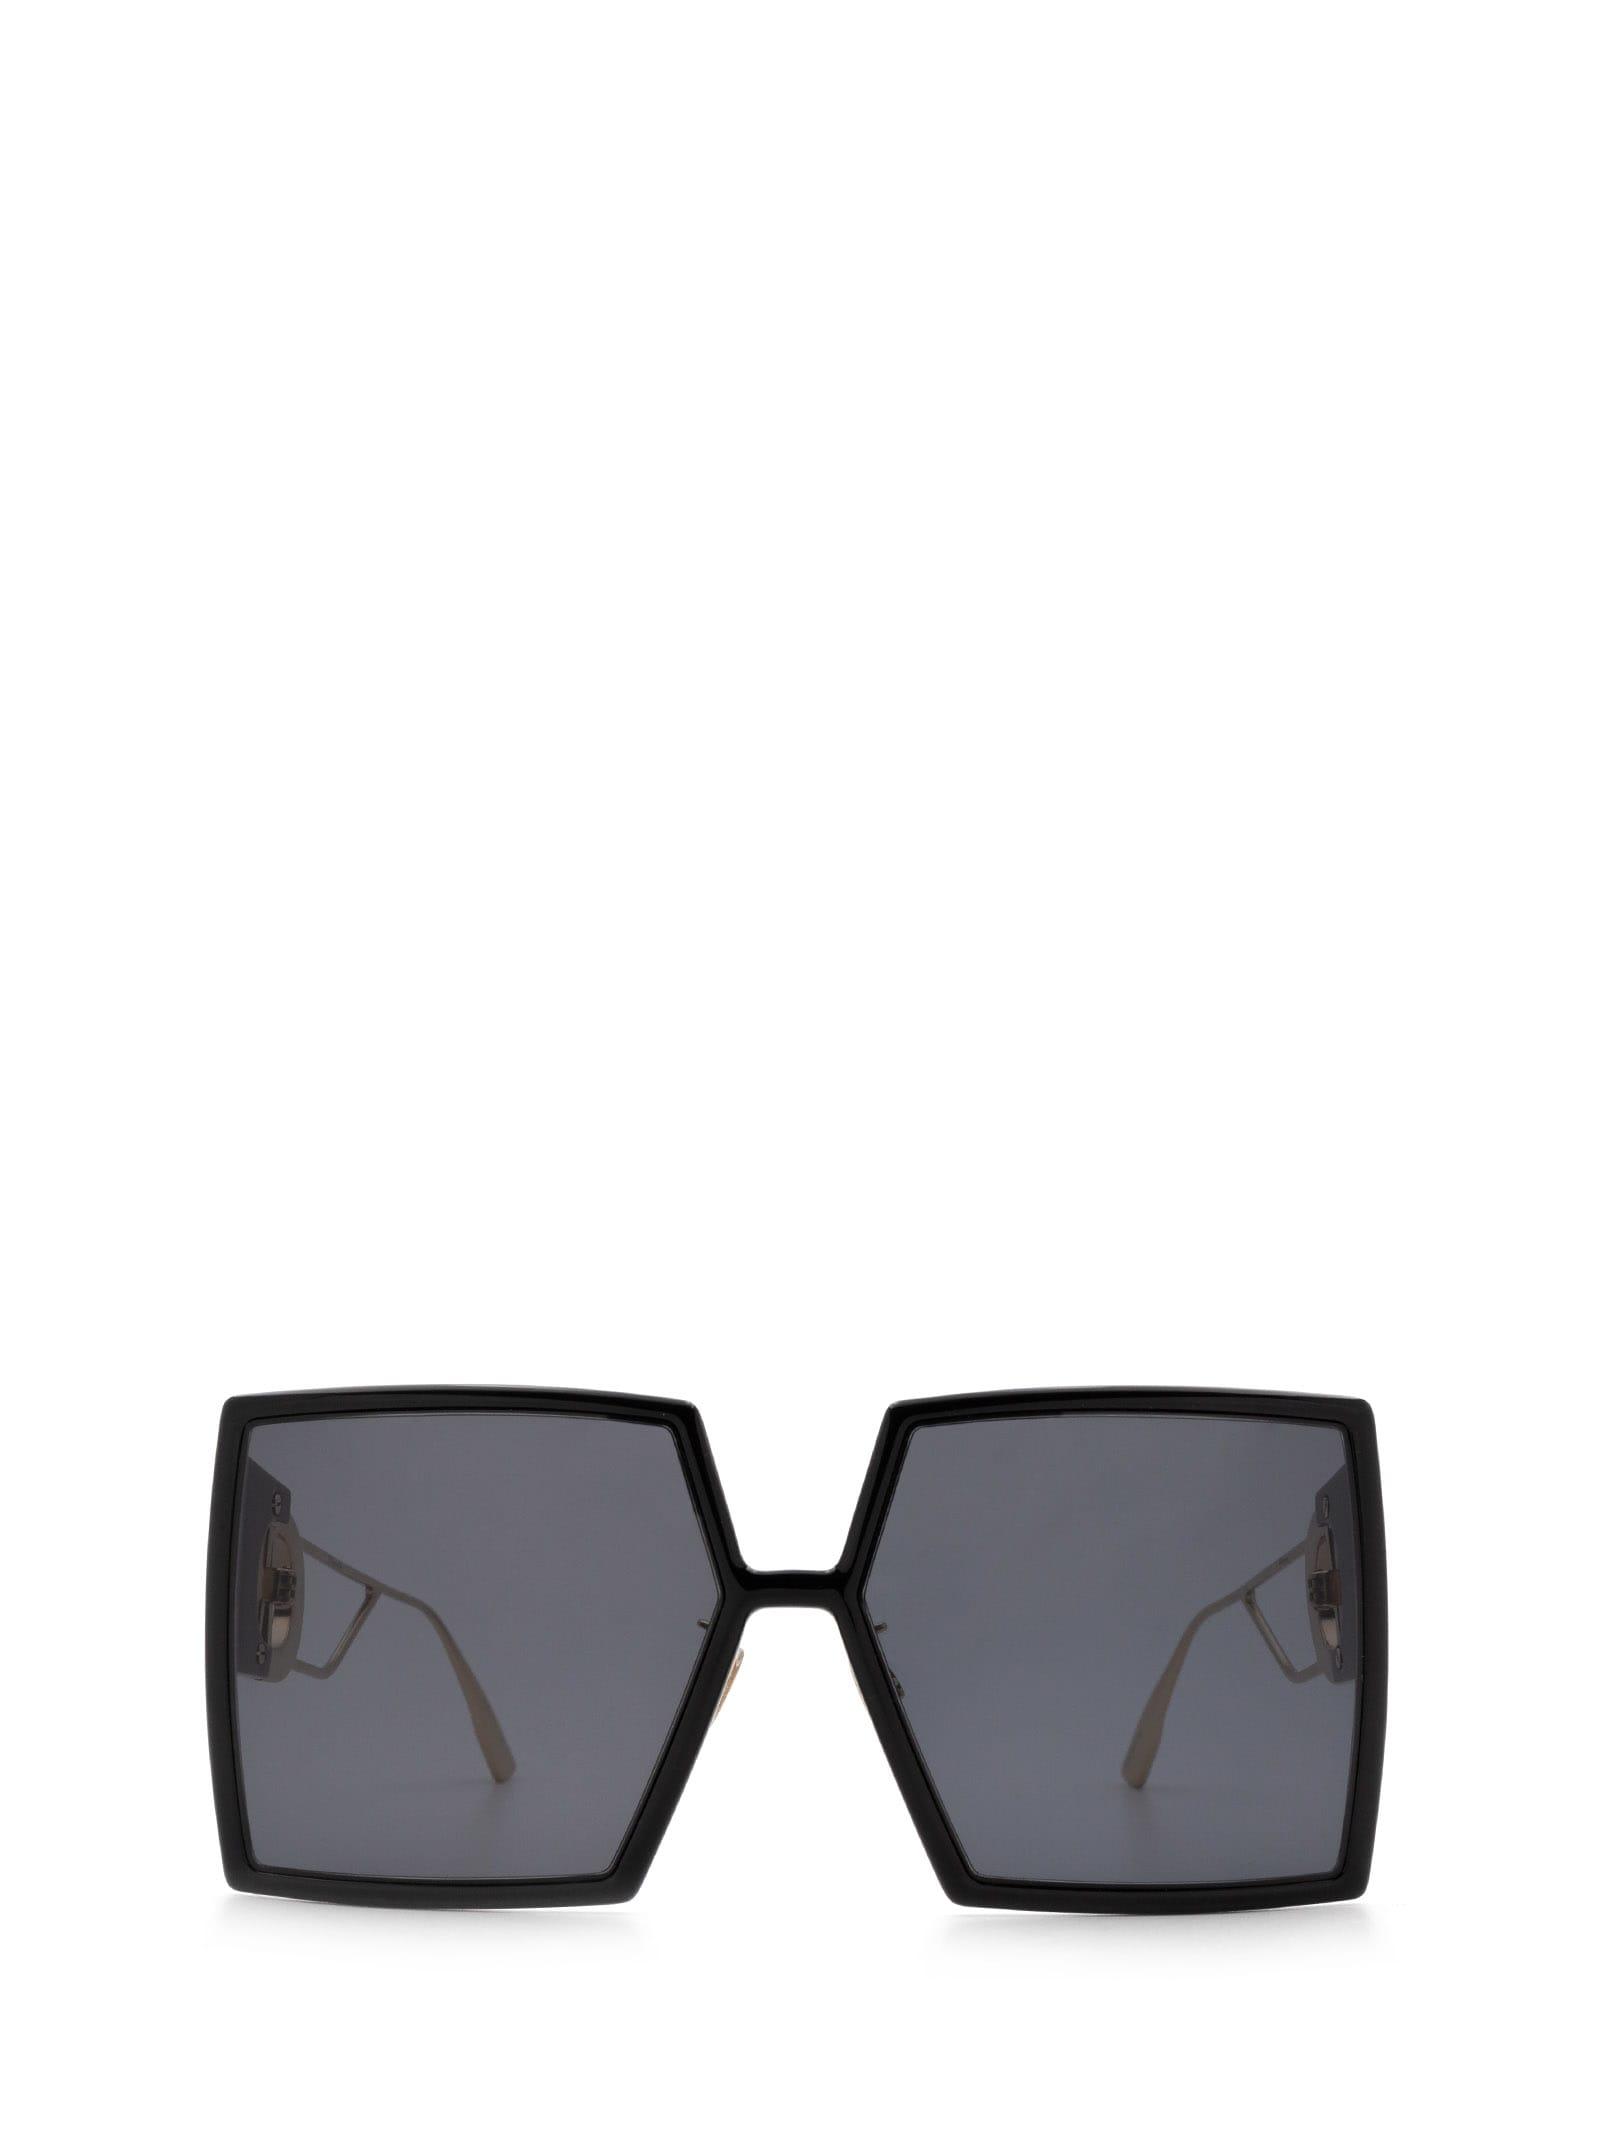 Dior 30MONTAIGNE BLACK SUNGLASSES